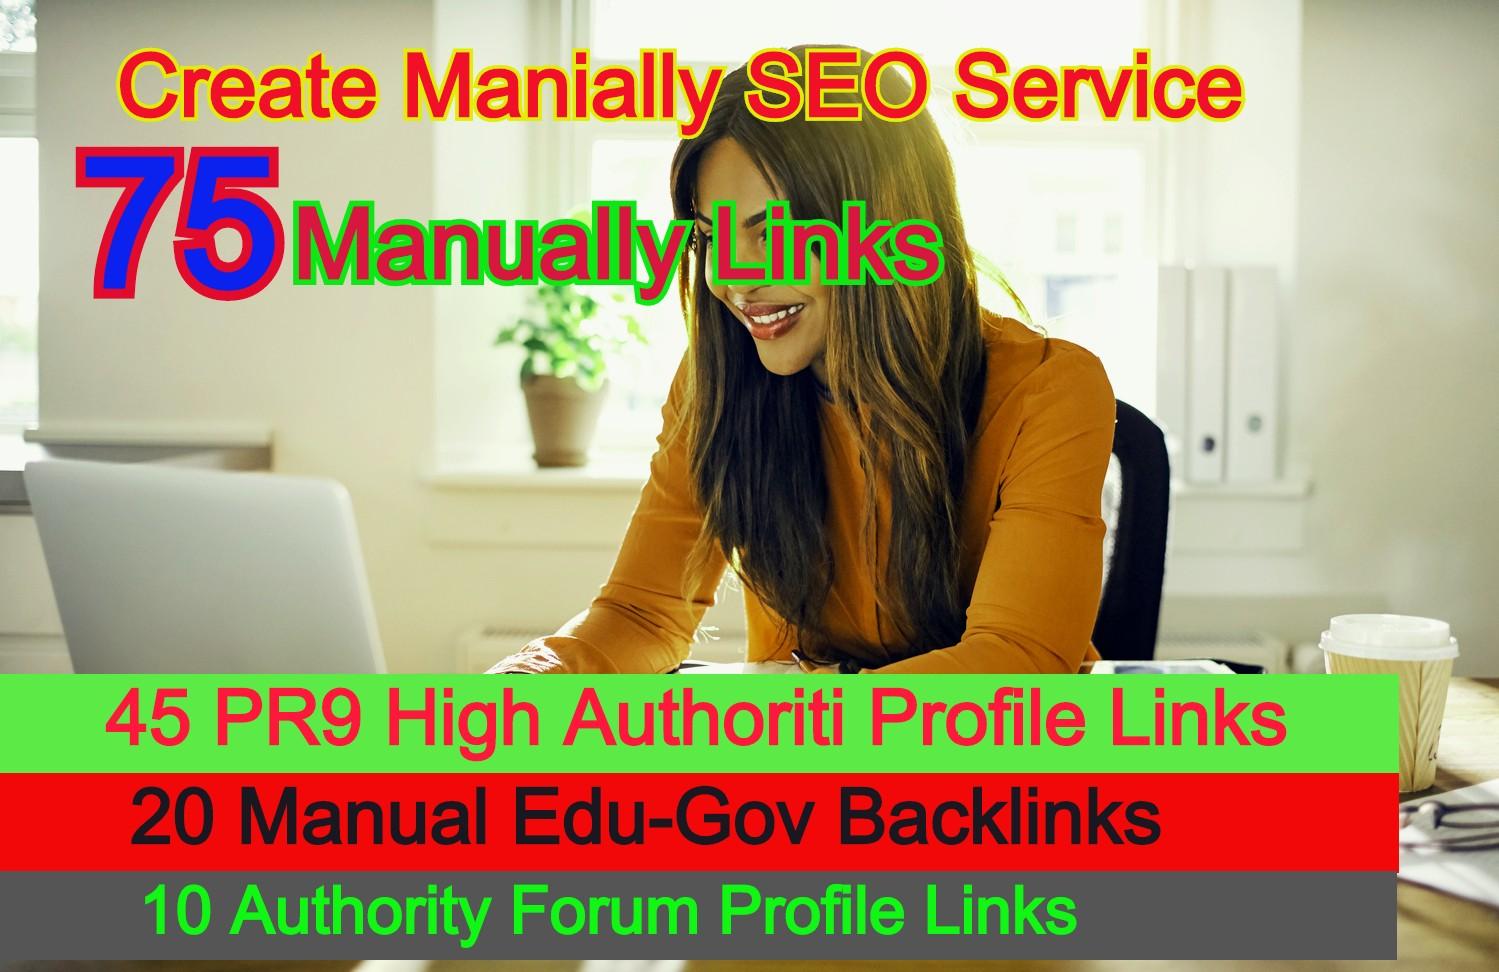 I Will Create 75 Manually Links From 45 PR9 + 20 Manually Edu-Gov Profile 10 Forum Profile links